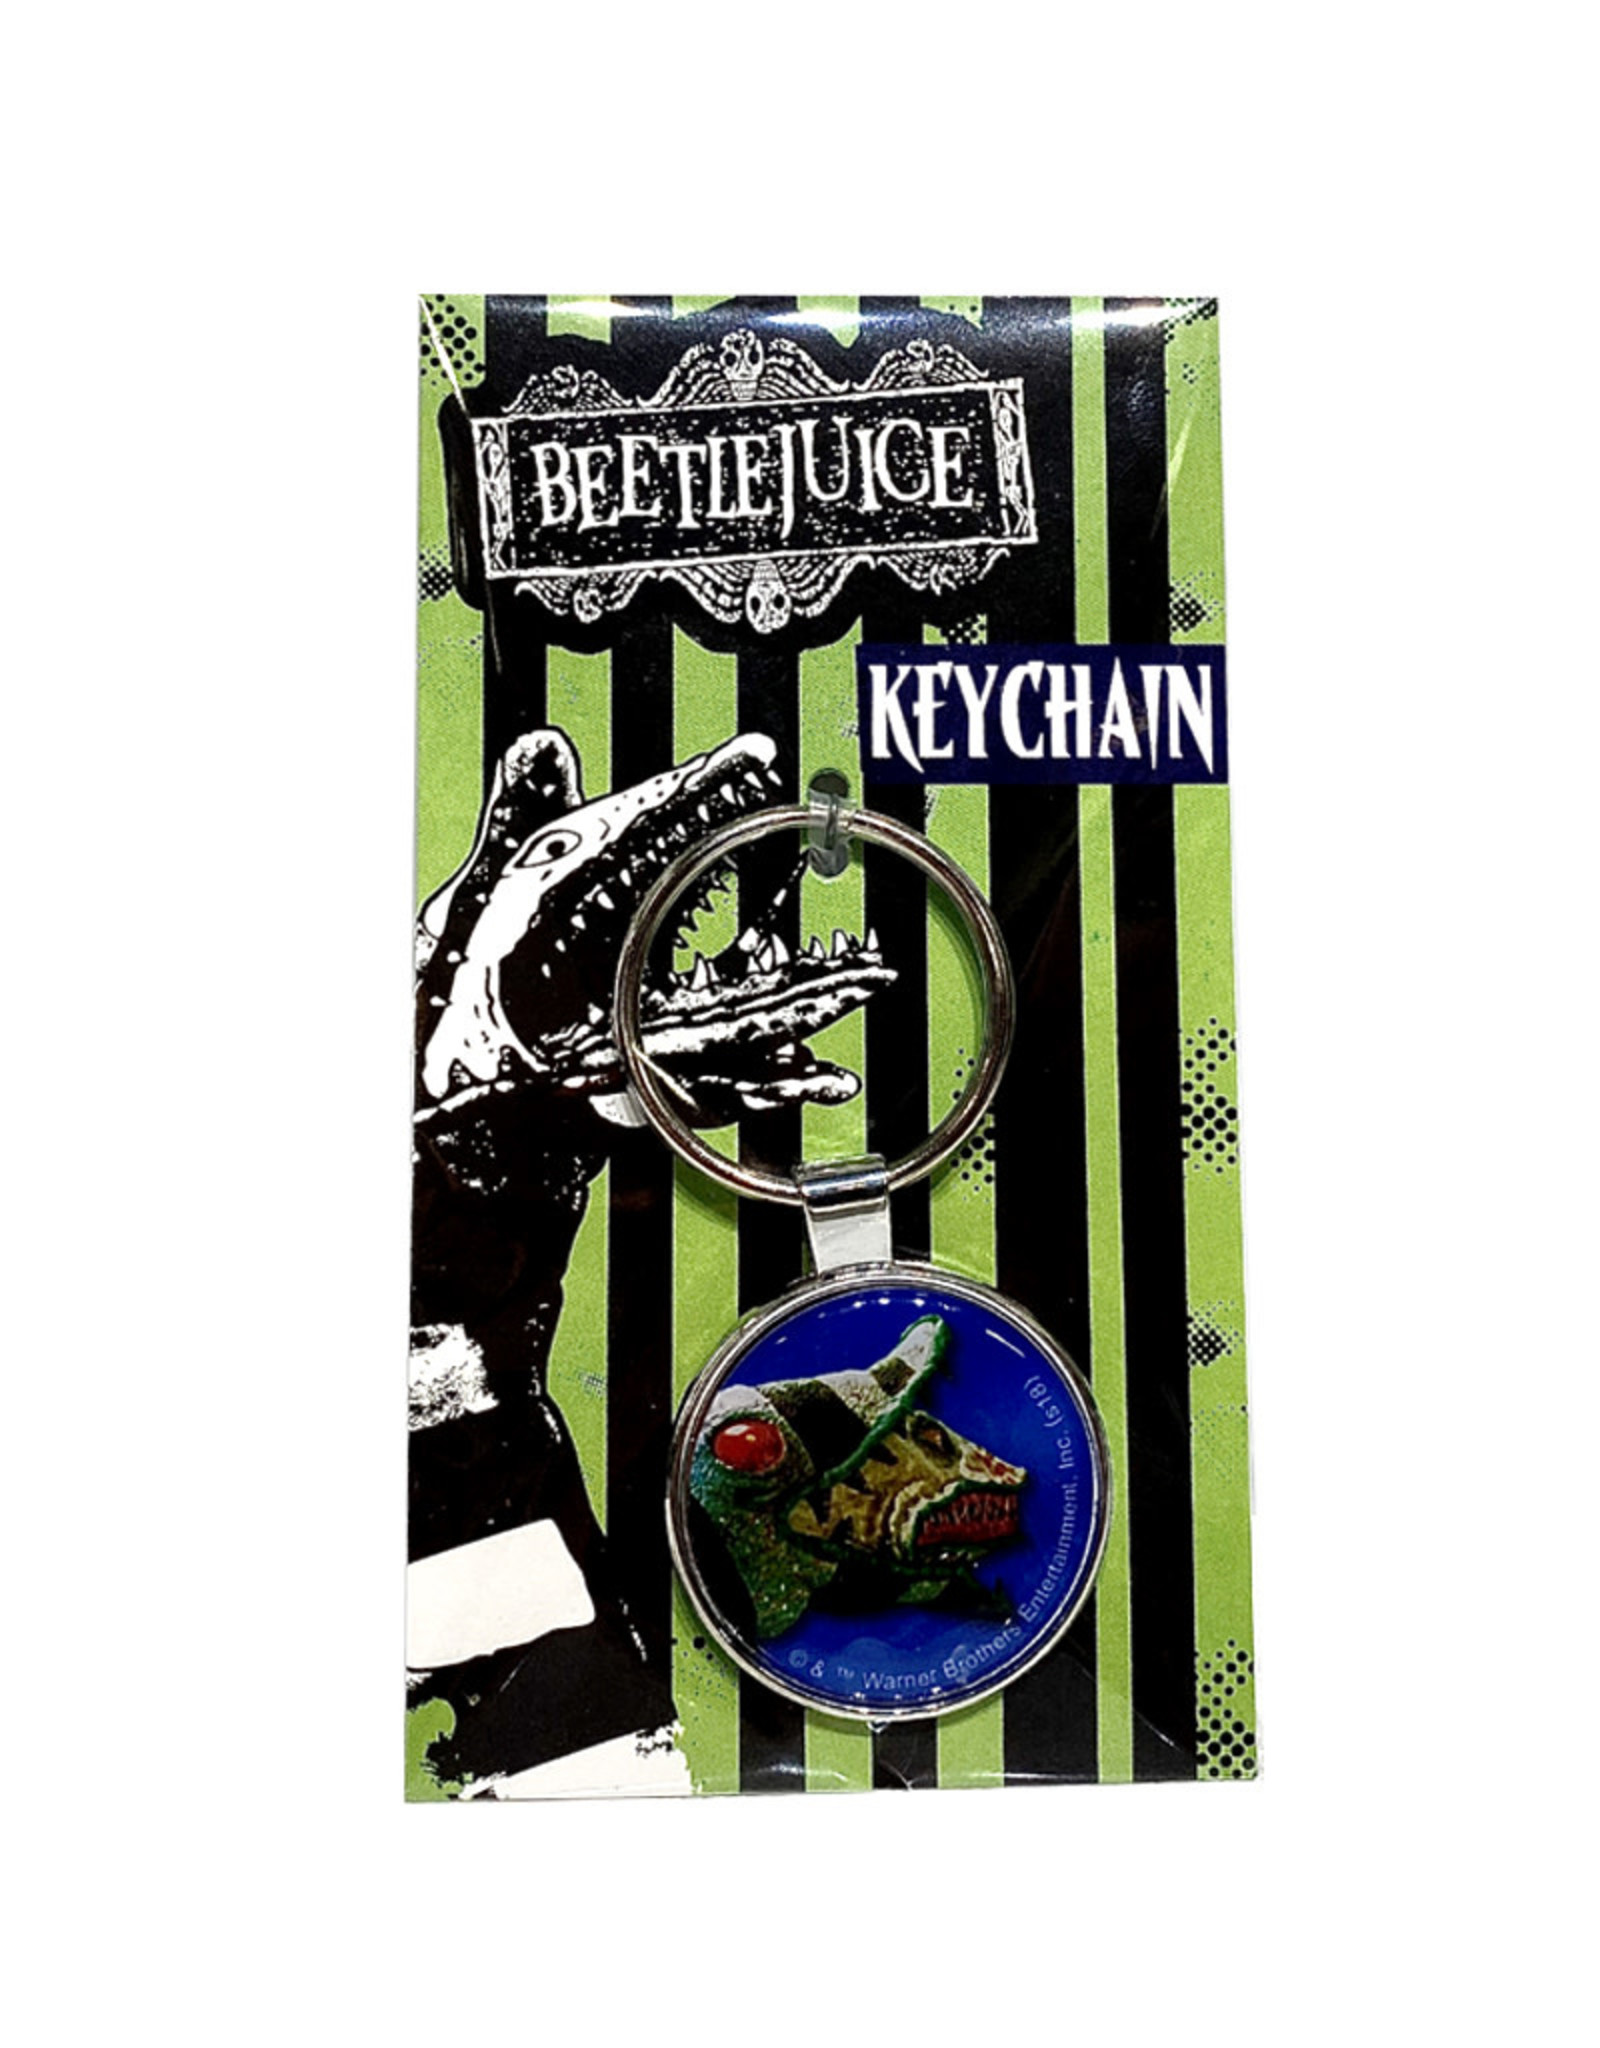 Beetlejuice ( Keychain )